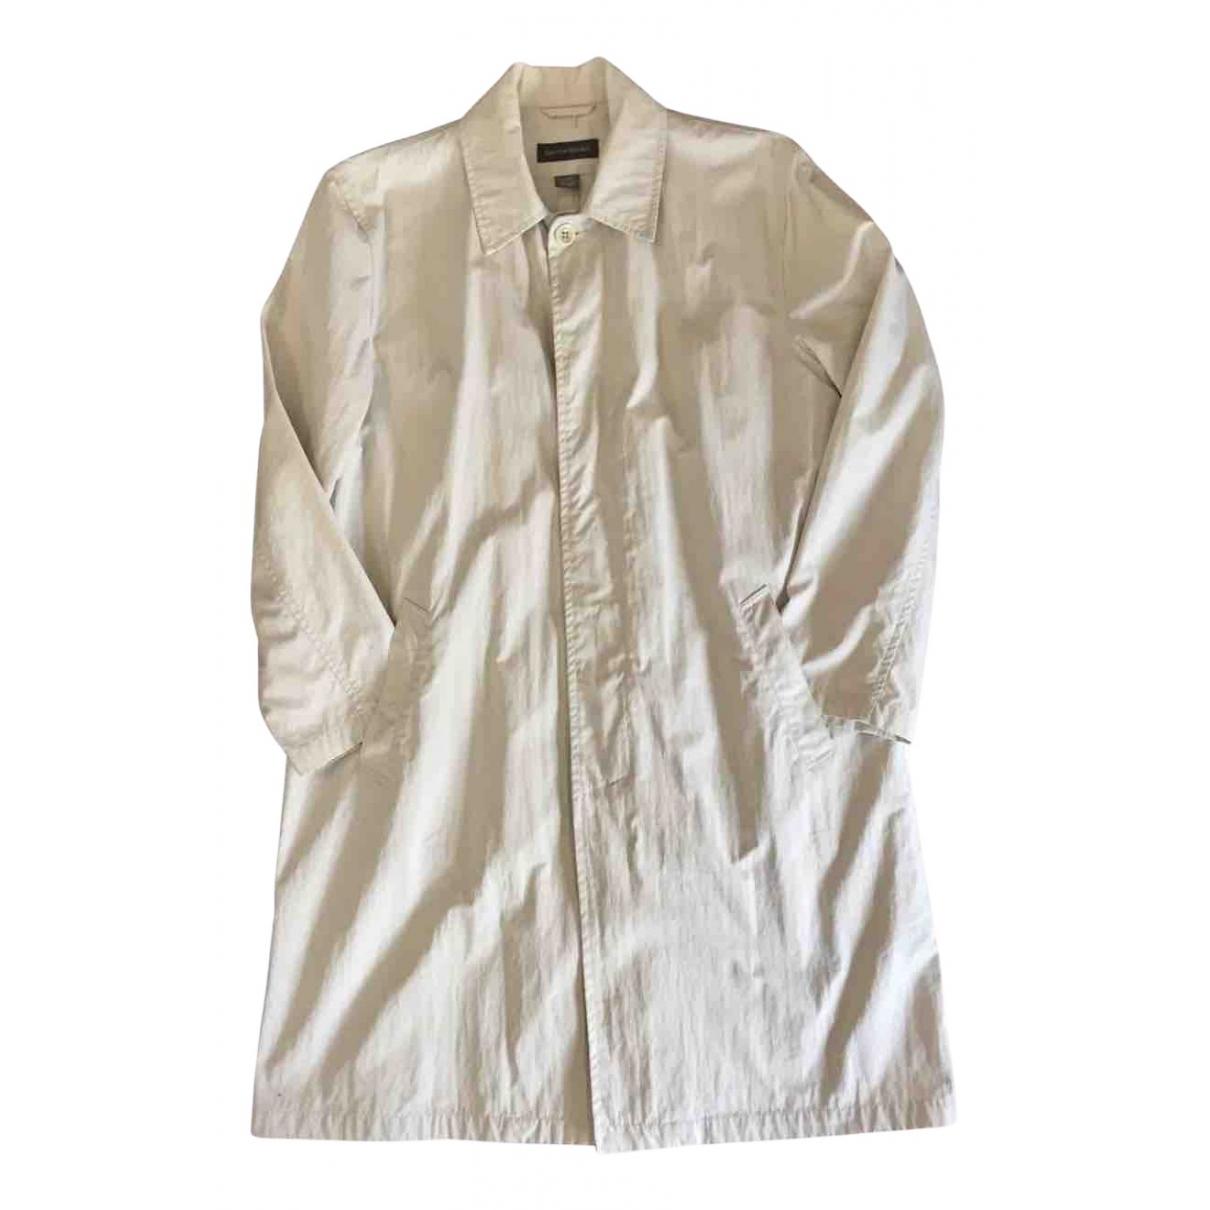 Banana Republic - Manteau   pour homme en coton - ecru